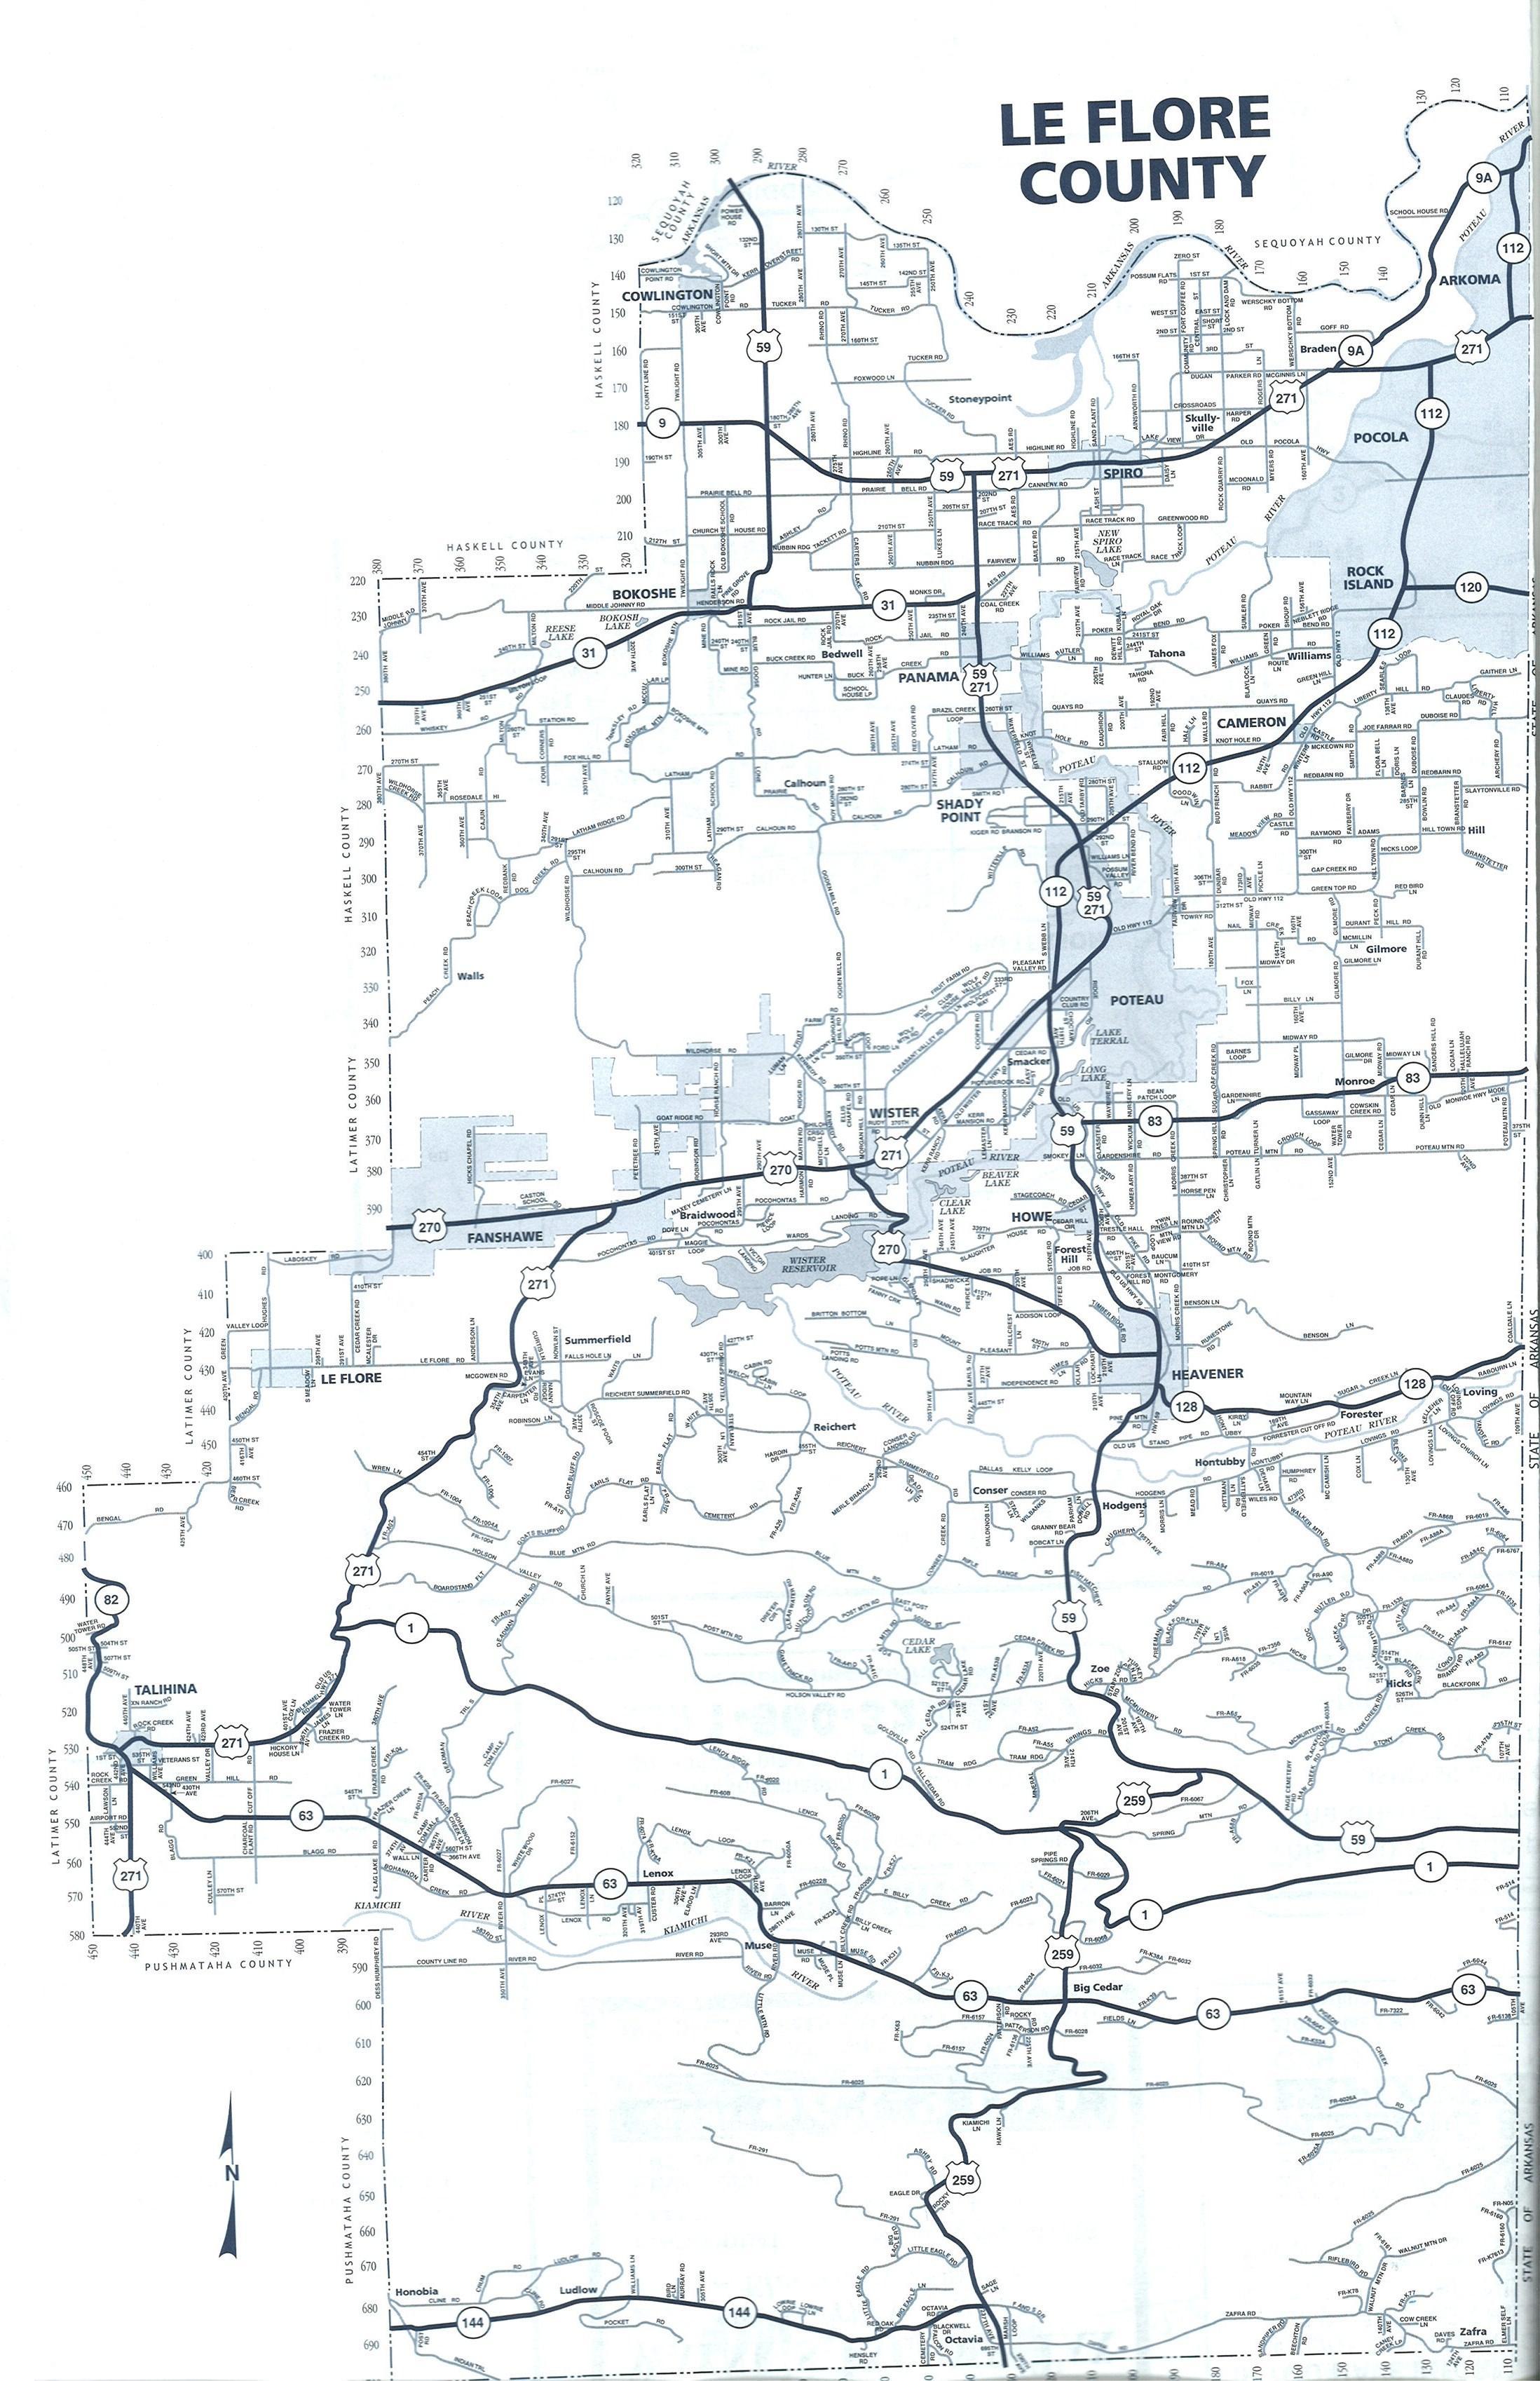 Leflore County Oklahoma Map.City Of Heavener Oklahoma Prairie Of The Tall Grass